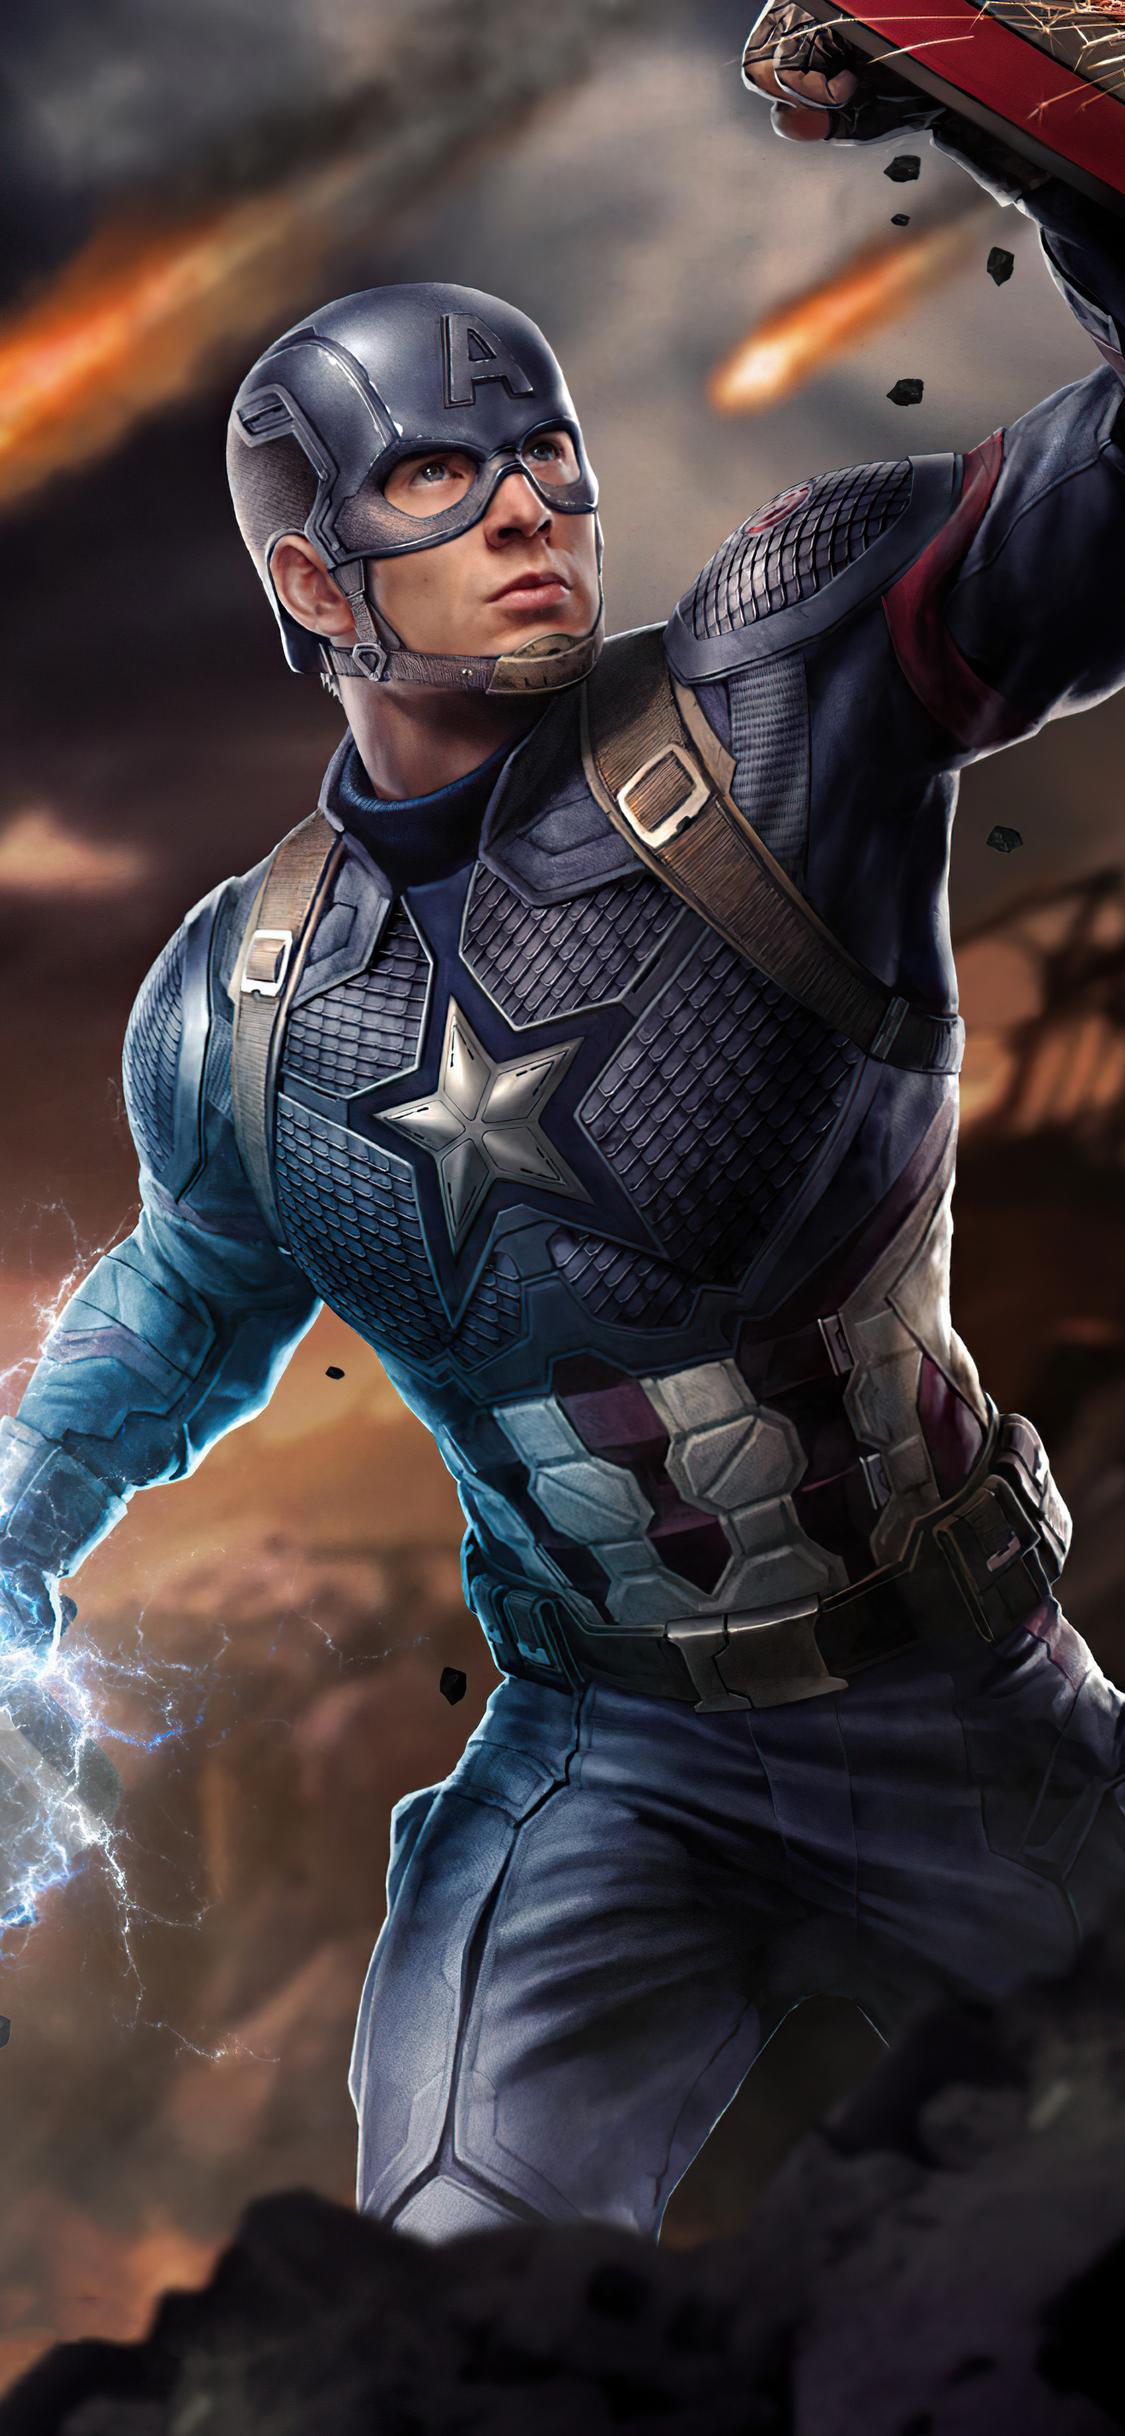 captain-america-shield-and-thor-hammer-m9.jpg